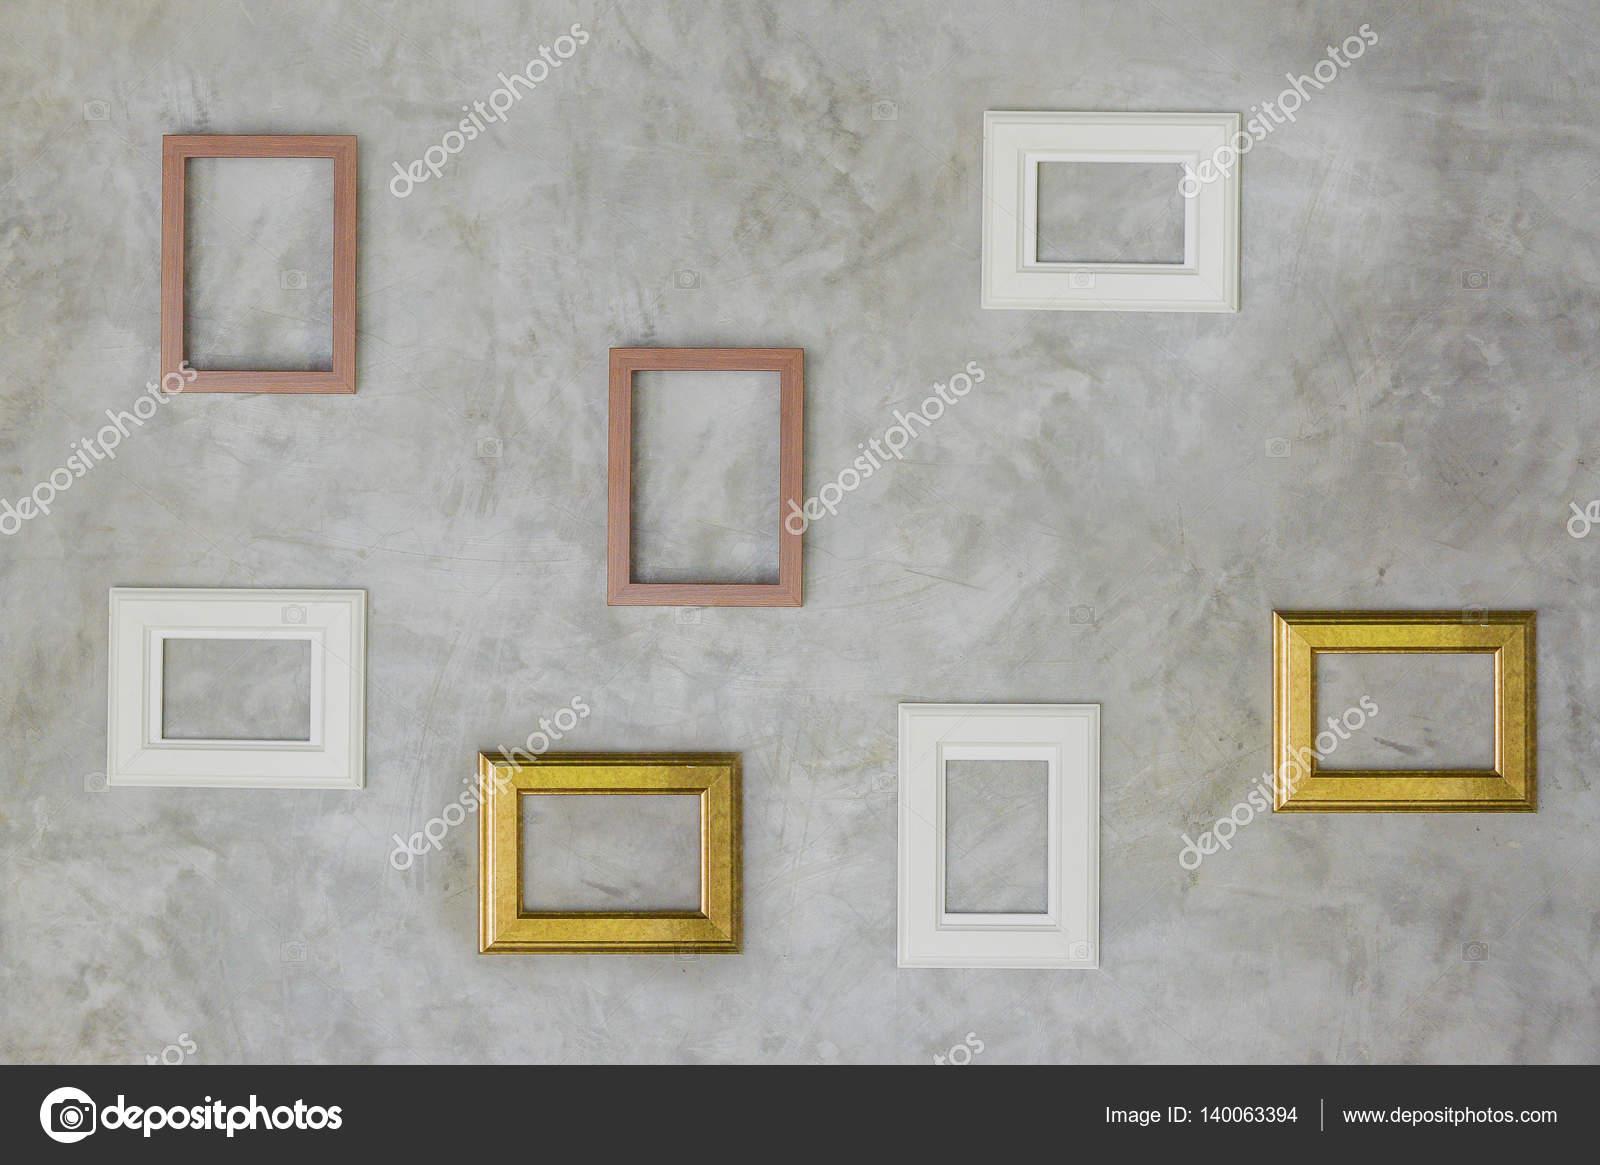 Leere Bilderrahmen an Wand — Stockfoto © jaengpeng #140063394